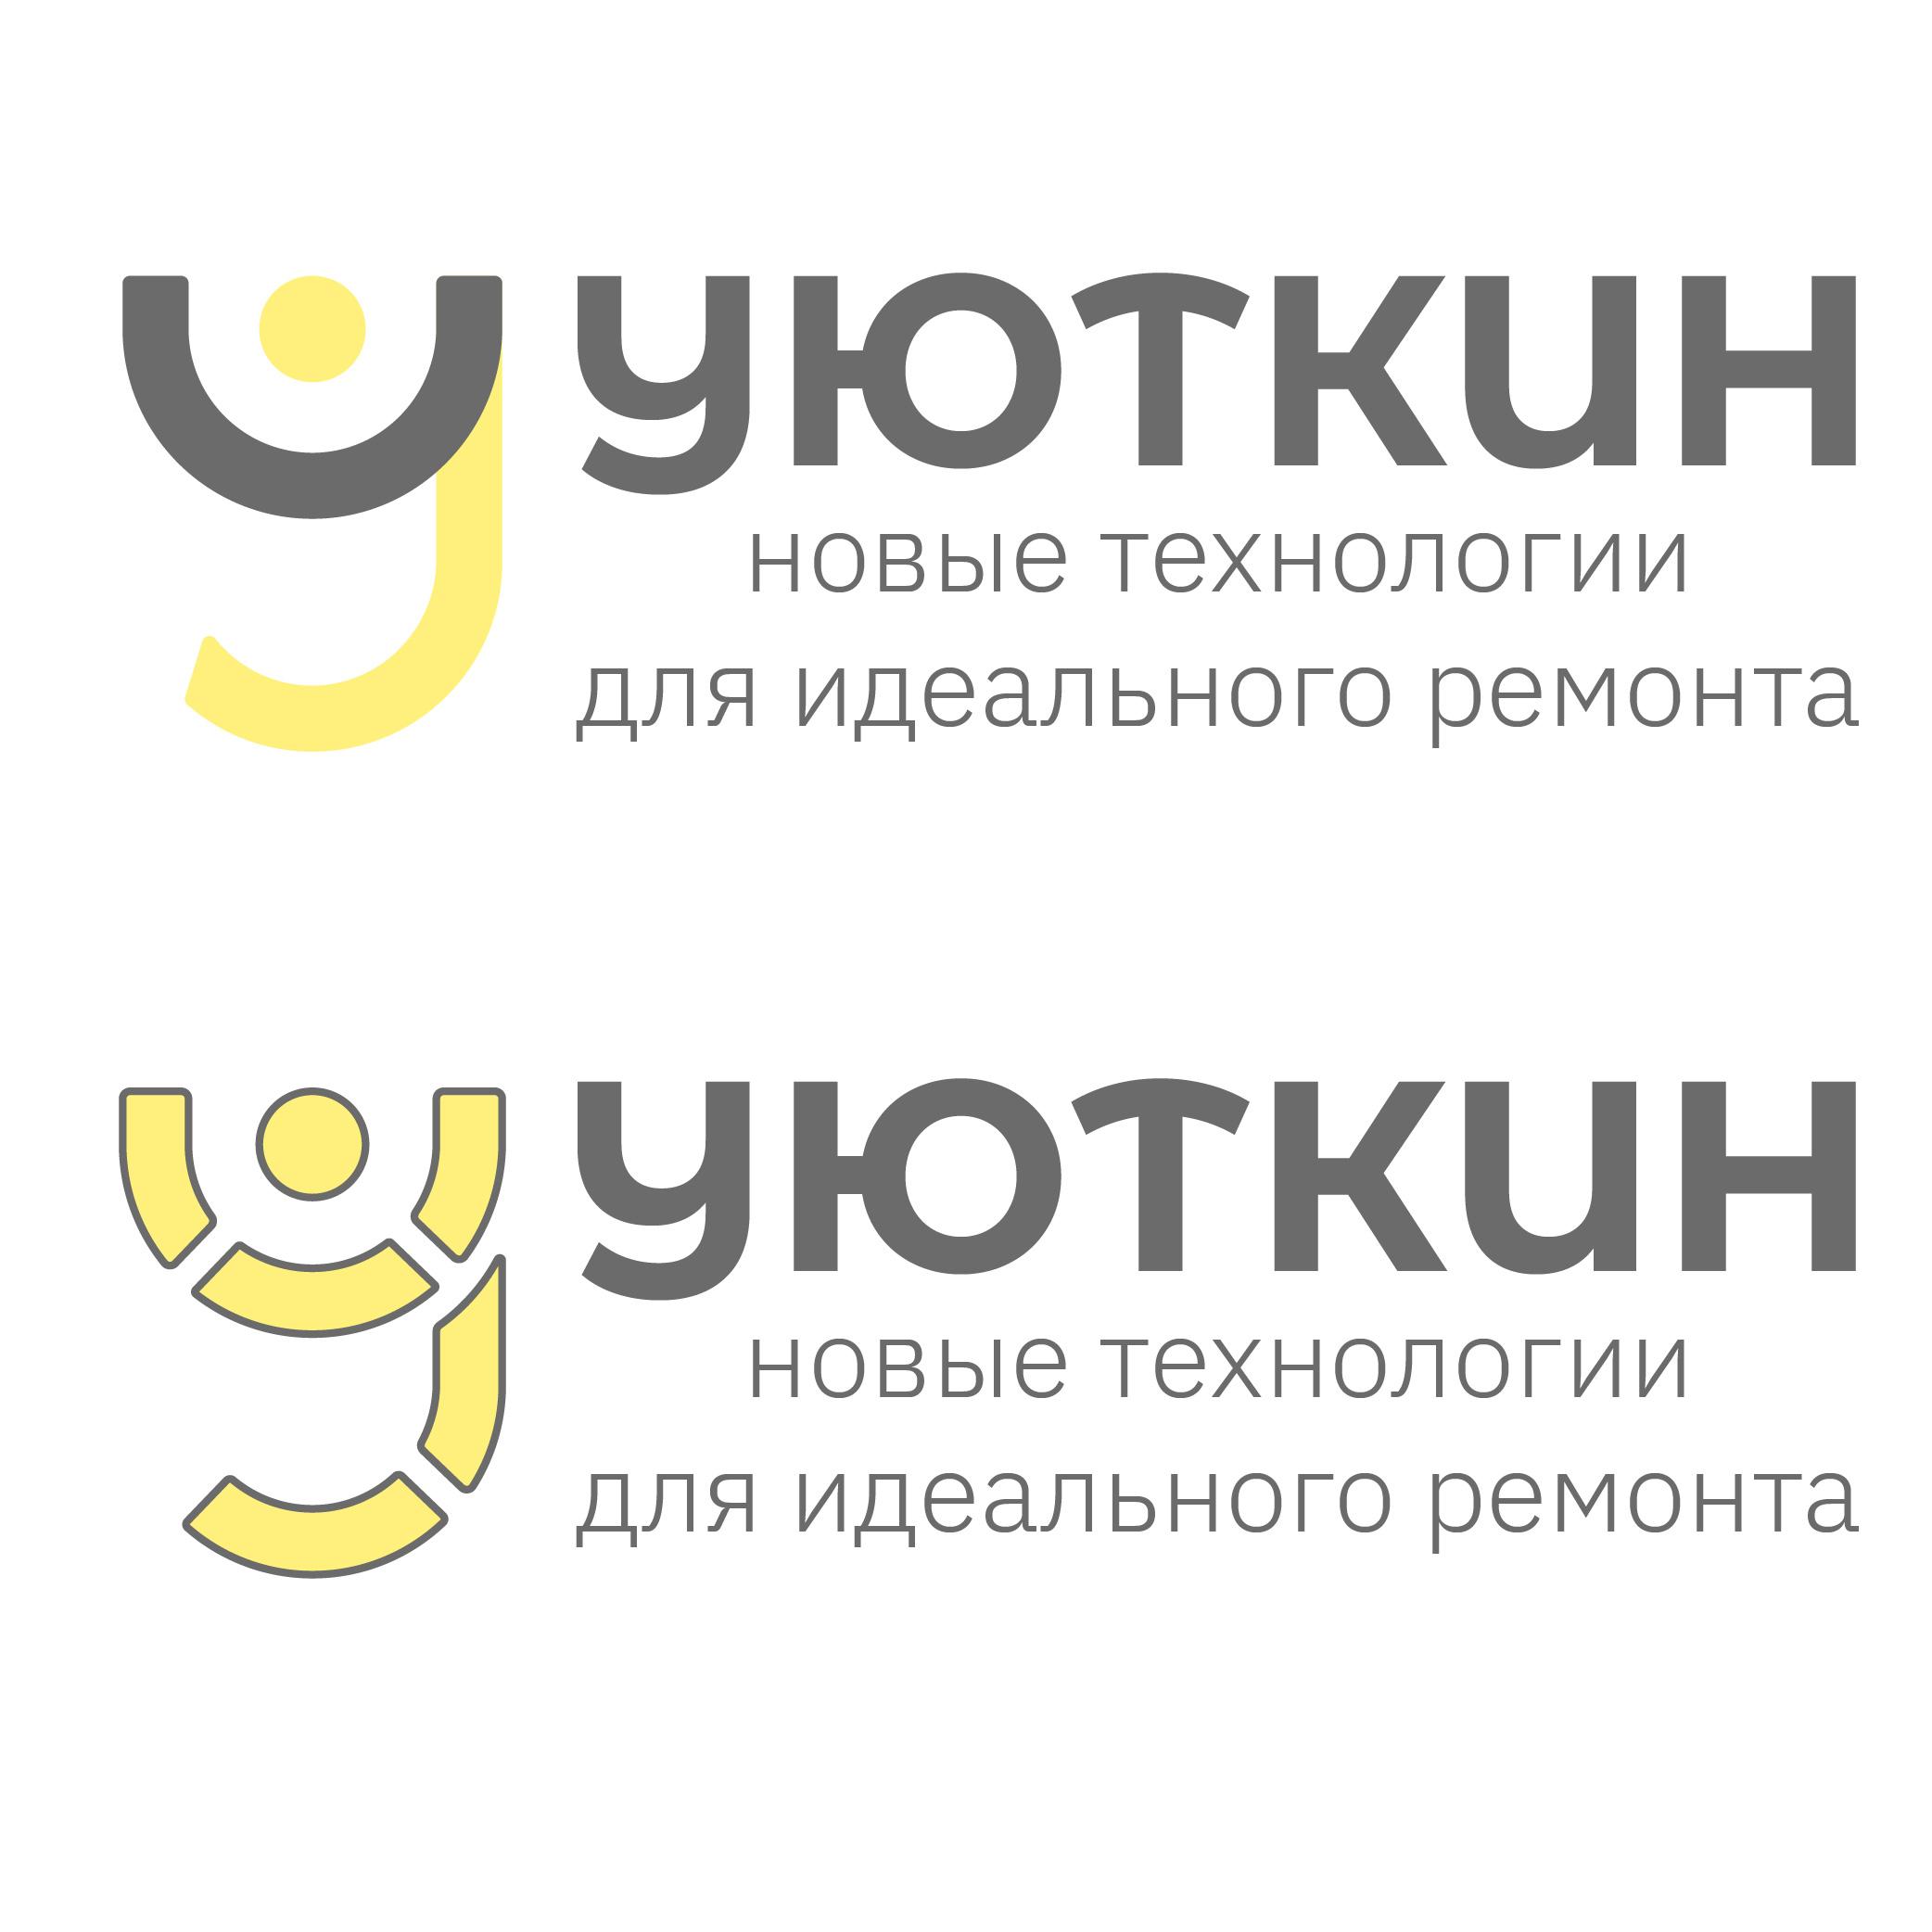 Создание логотипа и стиля сайта фото f_1385c645c2caf654.jpg